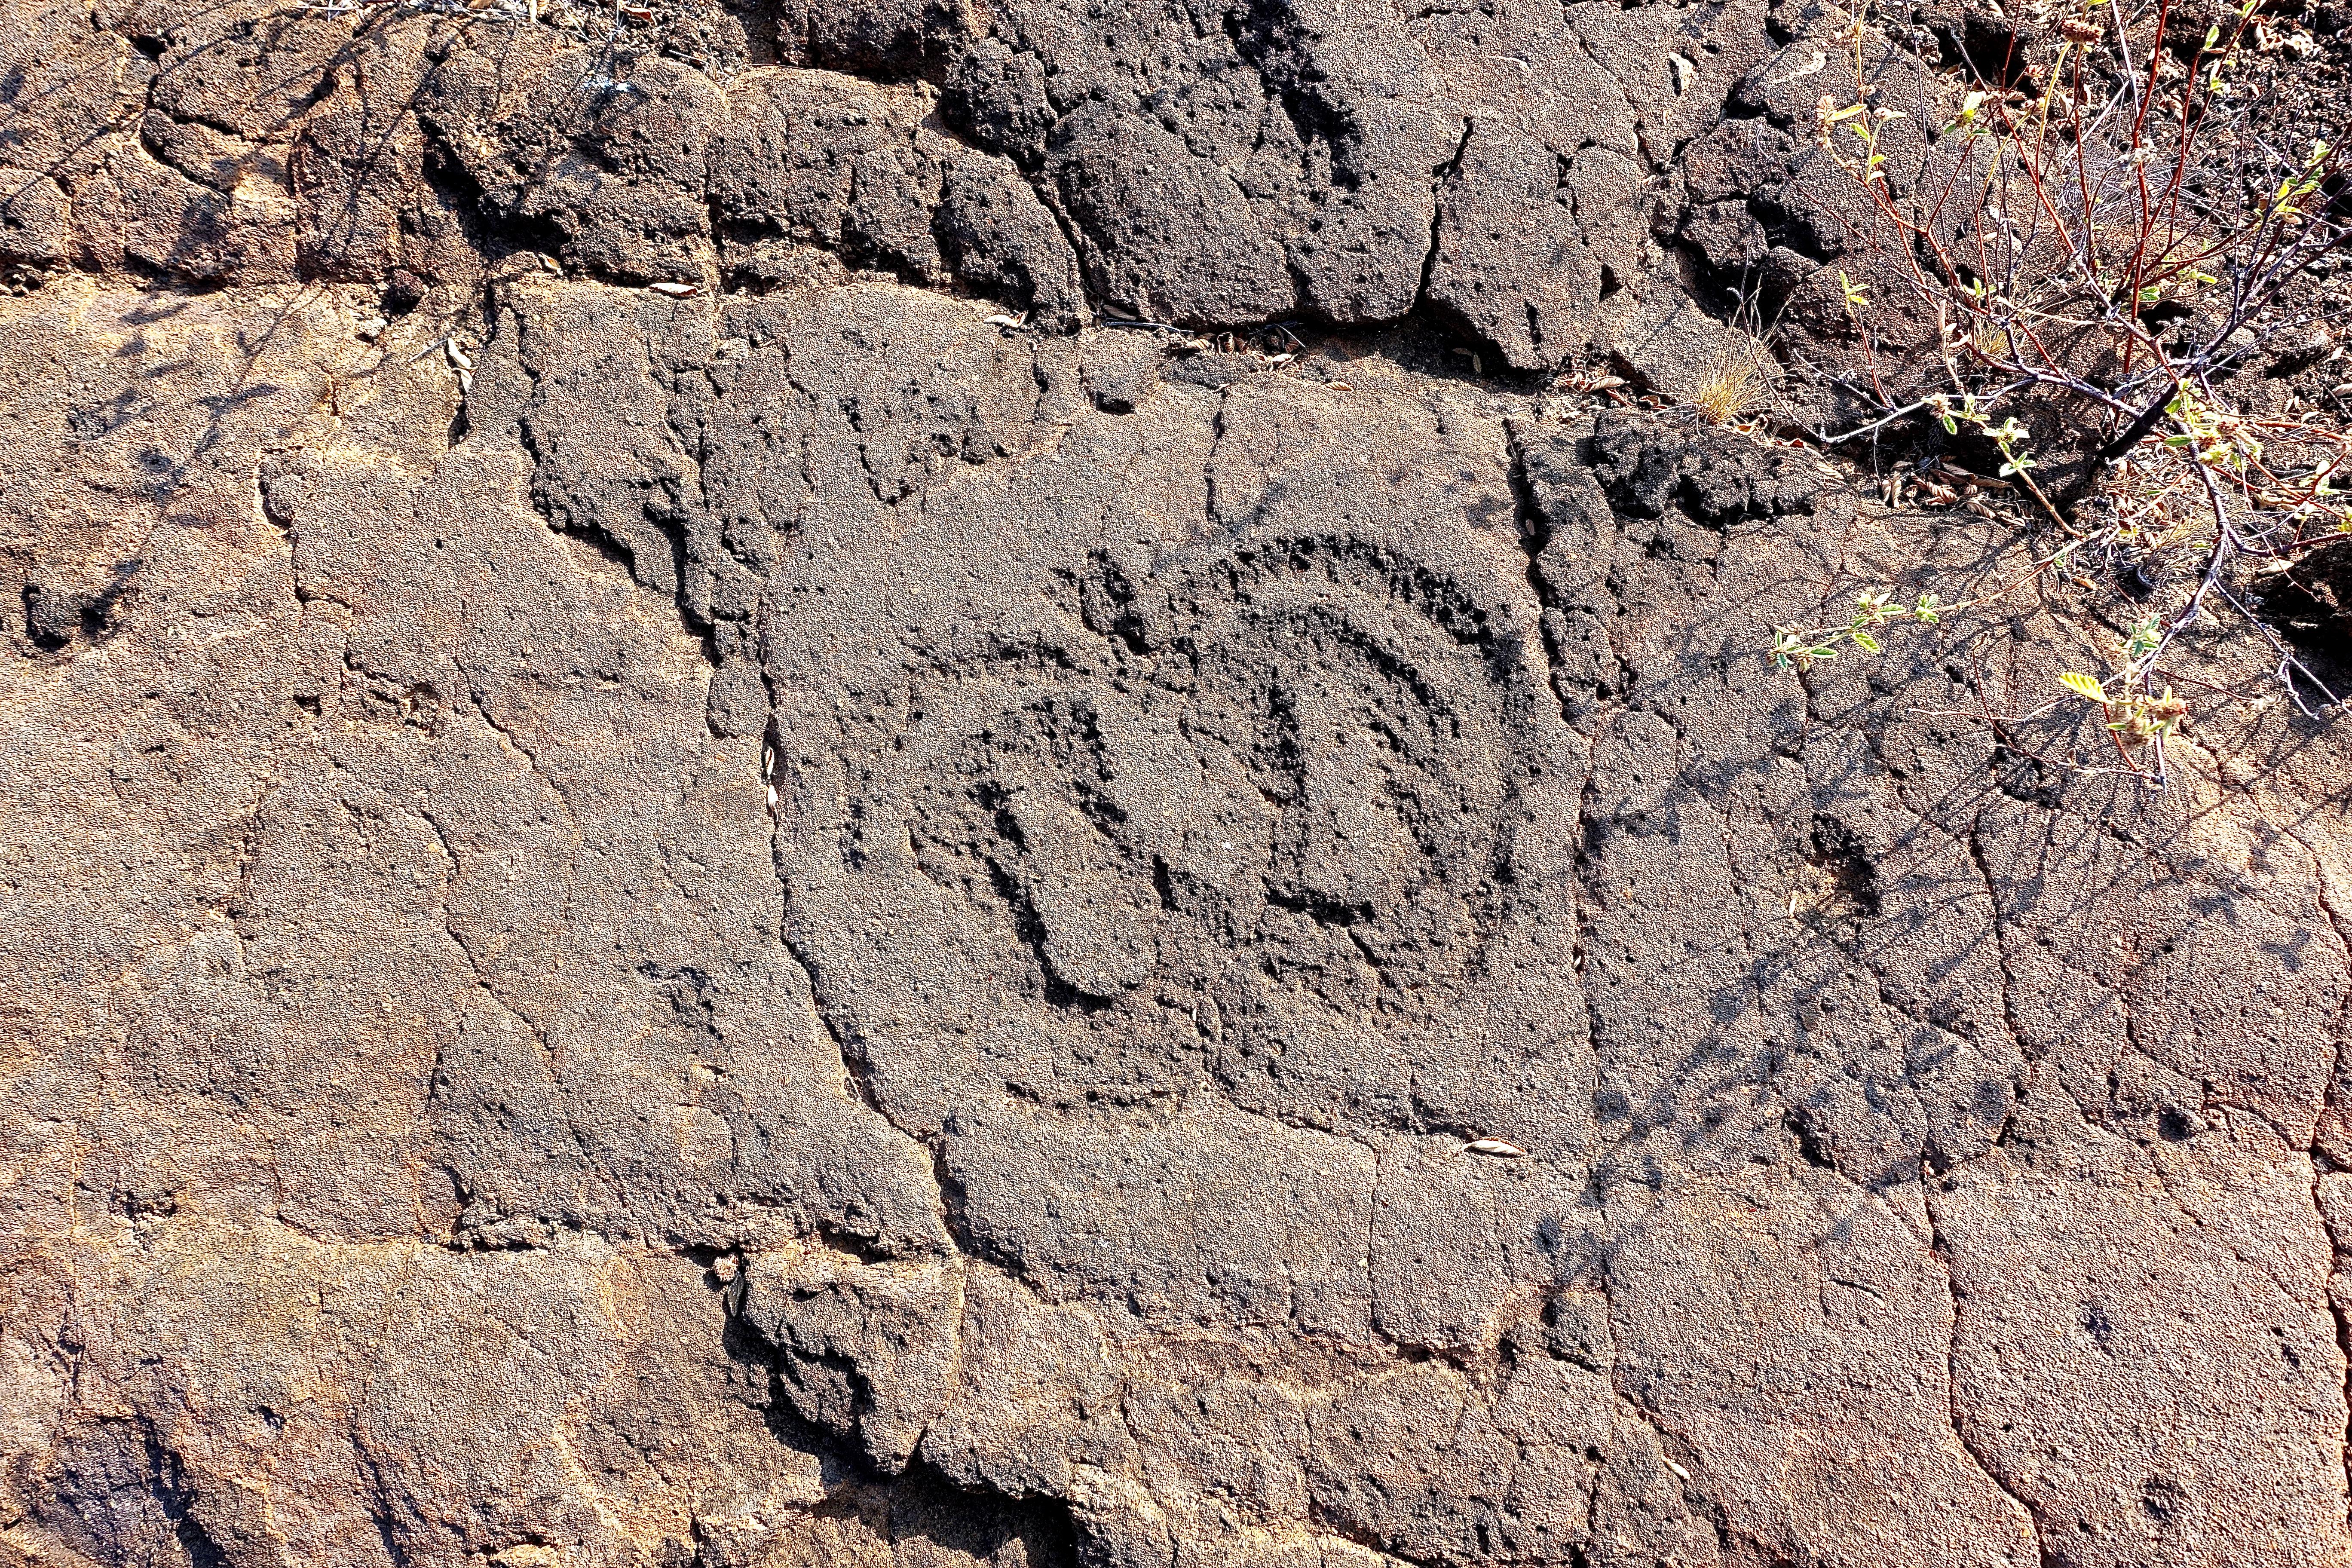 Petroglyph field near Waikoloa 4